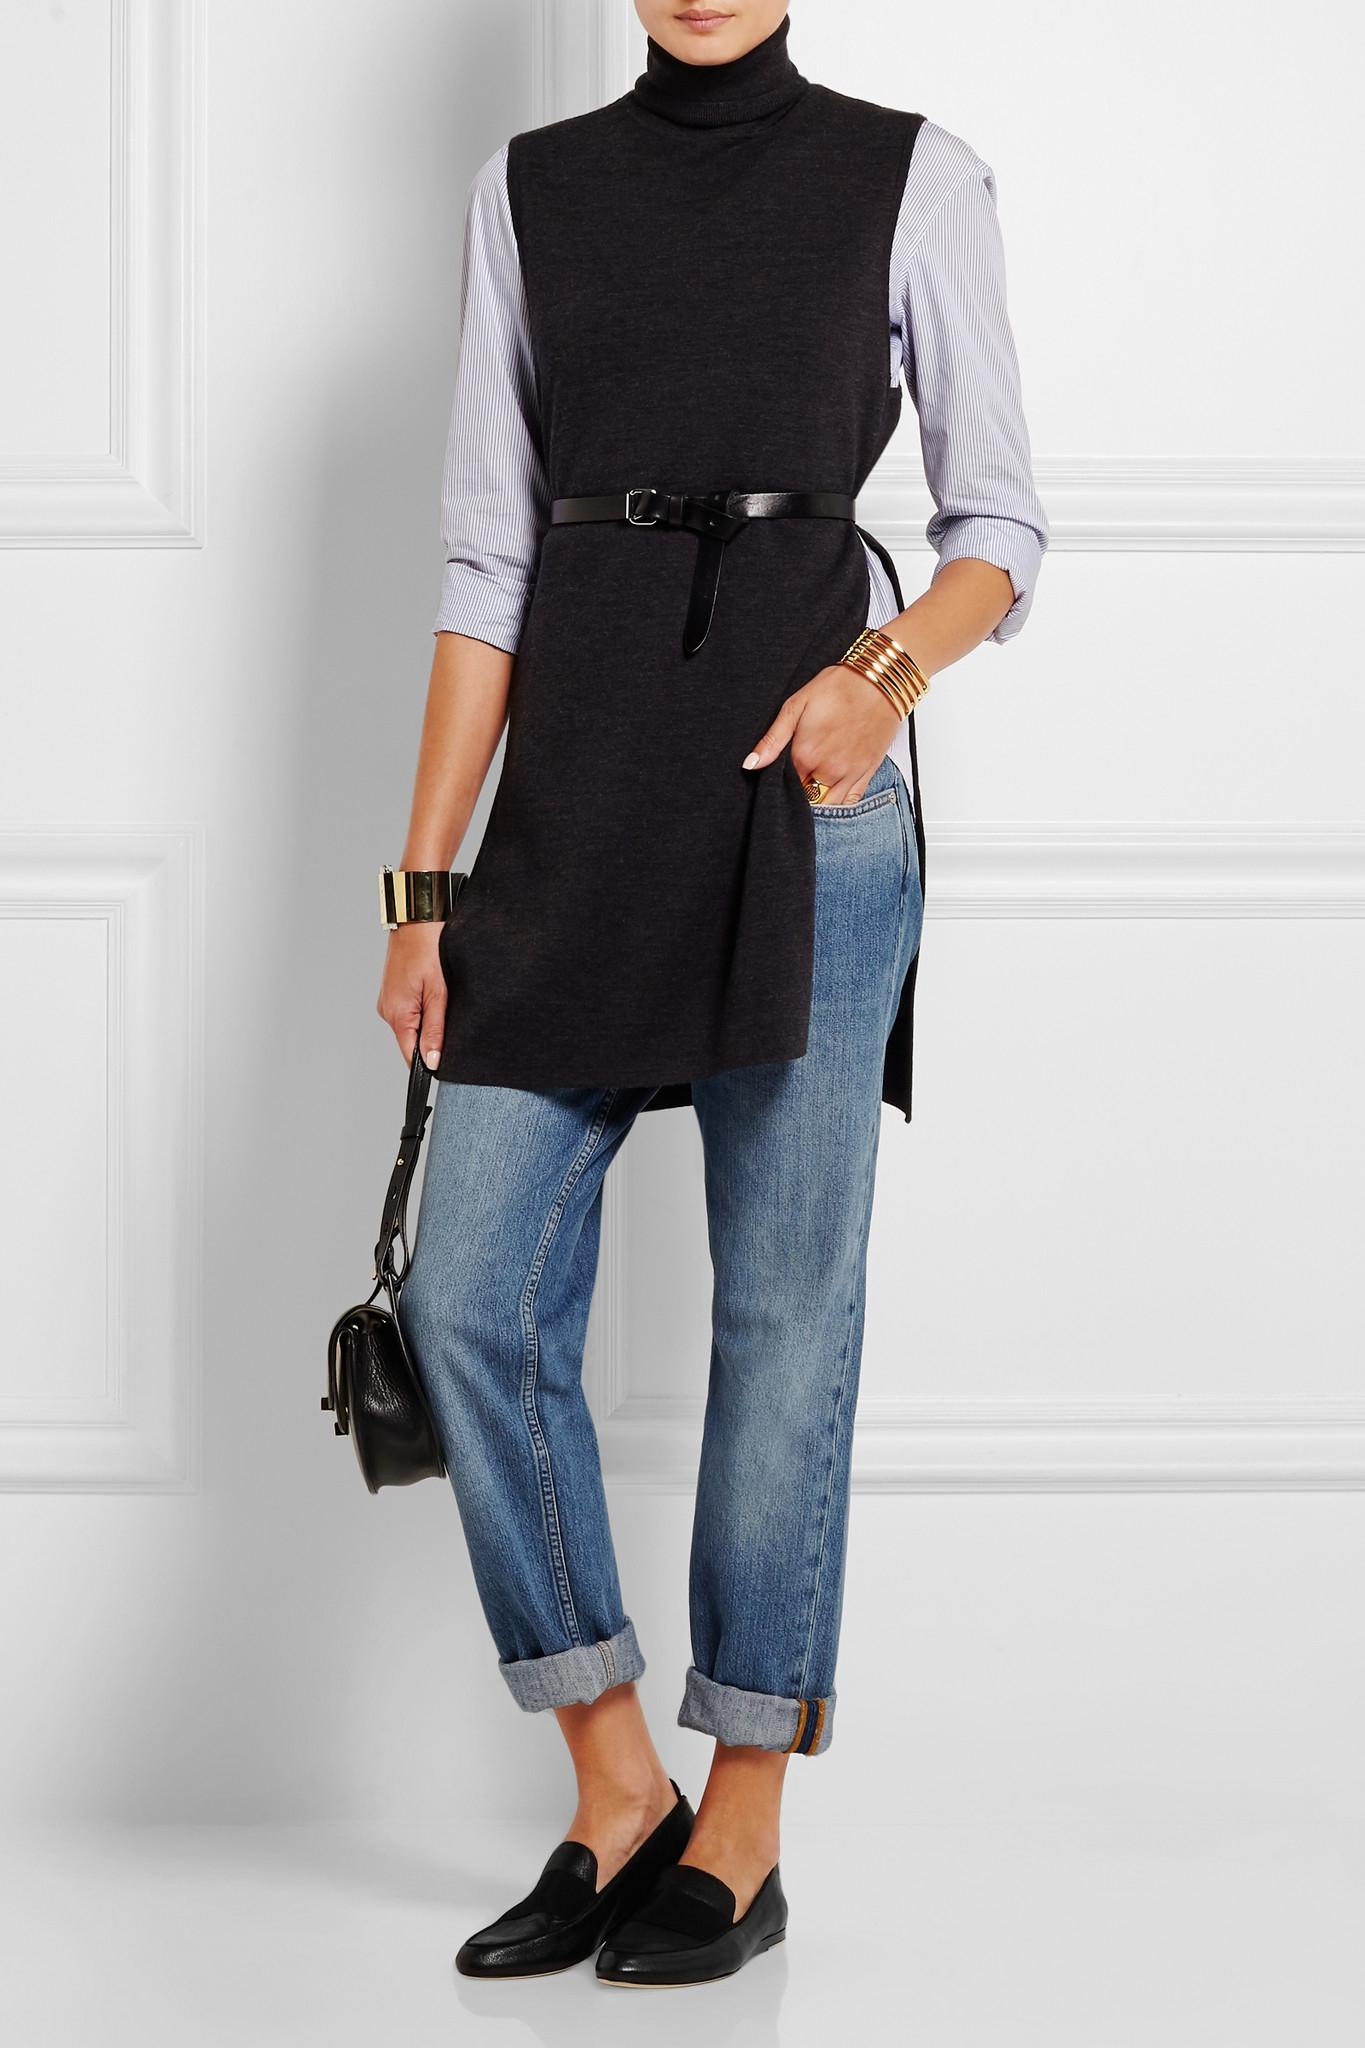 fbeab3f90f Rag & Bone Sia Grosgrain-trimmed Textured-leather Loafers in Black ...